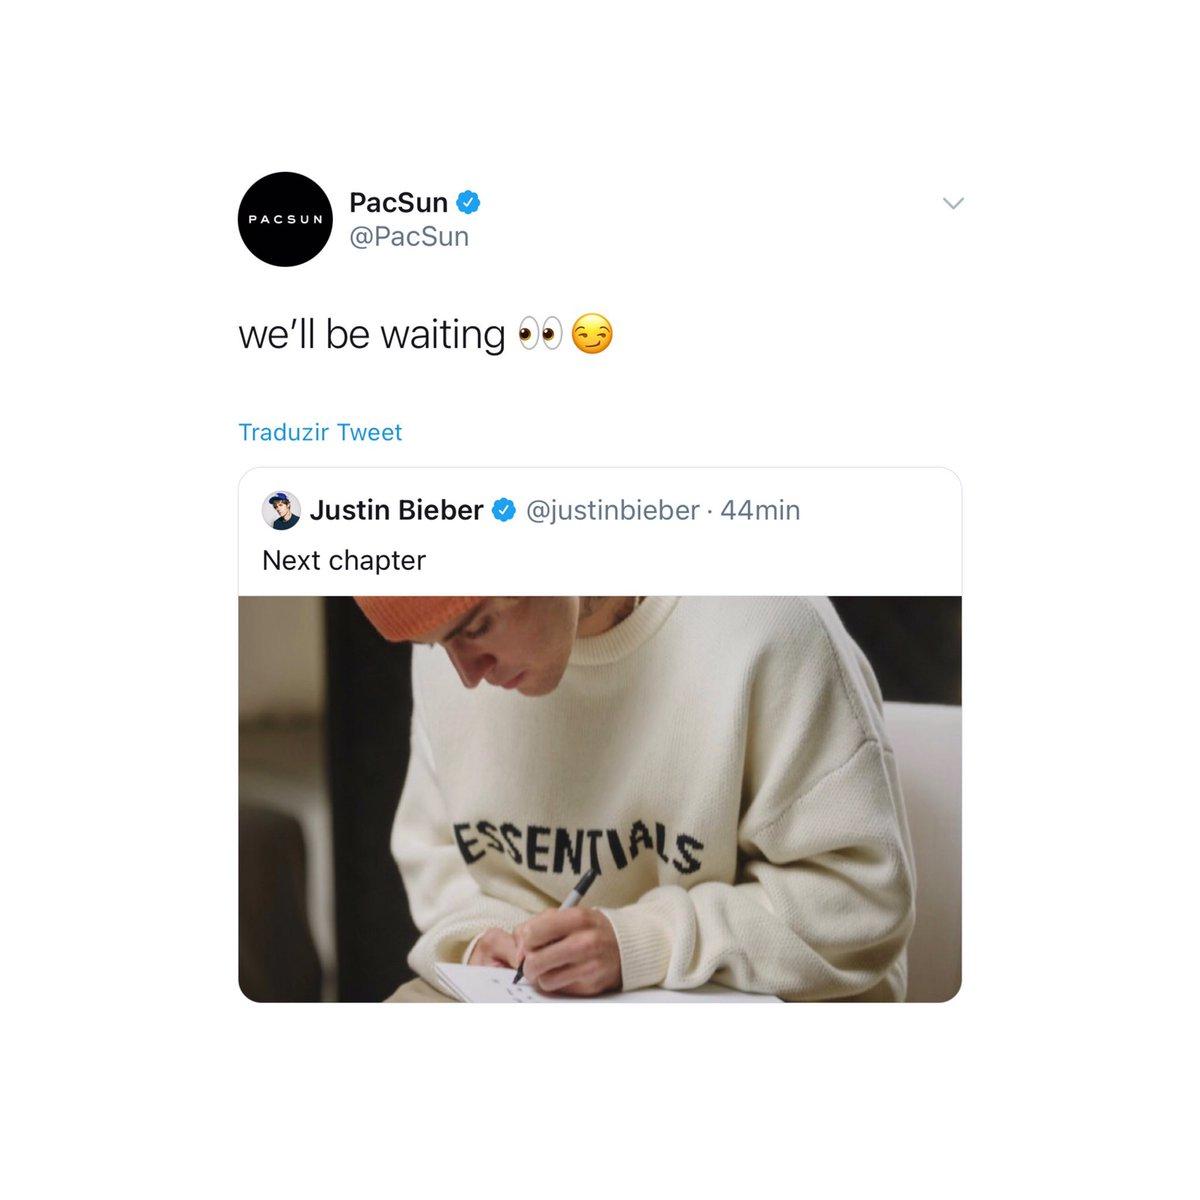 La marca que hizo la merch de PurposeTour citó el tweet de Justin.   SIEMPRE GANANDO JUSTINERAS https://t.co/rRdFMwA1qx